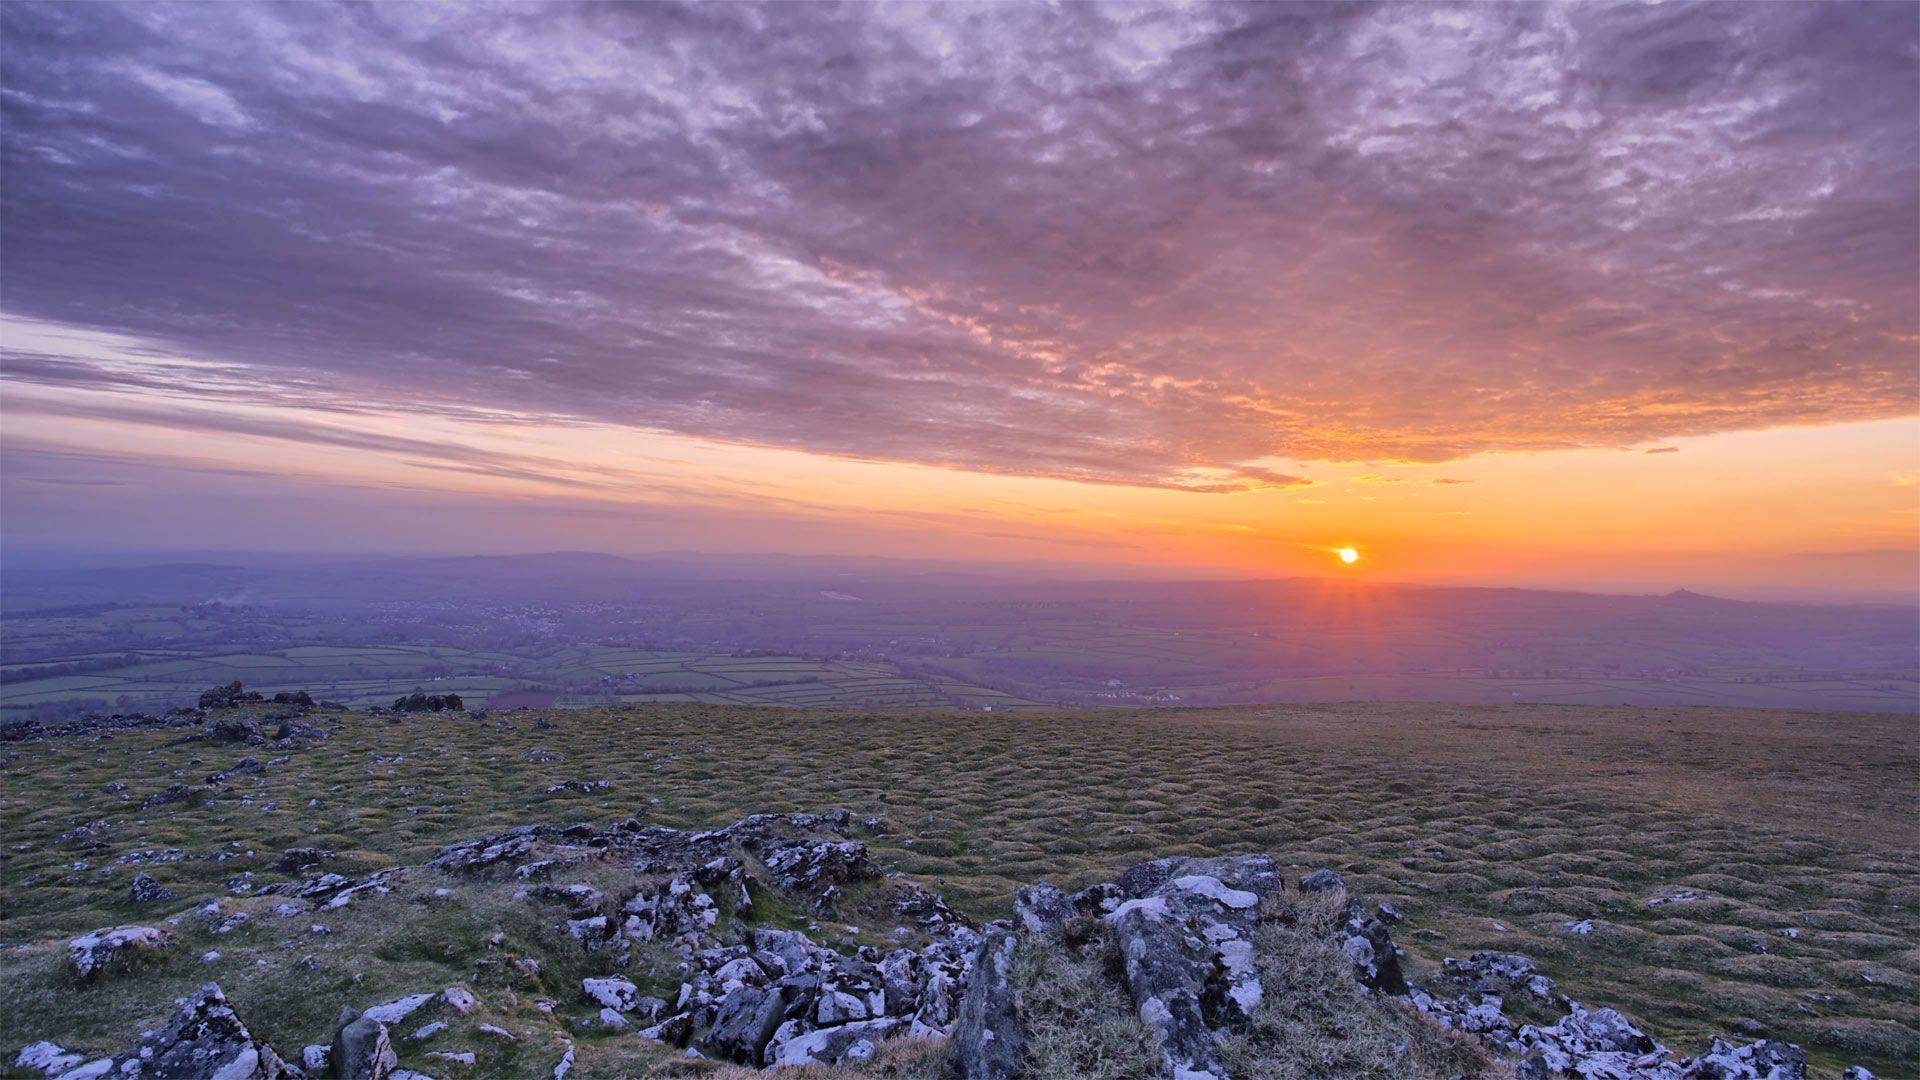 Sun setting in Dartmoor National Park, Devon, England (© Jonathan Scott/Nimia) – 2016-08-03 [http://www.bing.com/search?q=Dartmoor+National+Park&form=hpcapt&filters=HpDate:%2220160803_0700%22]